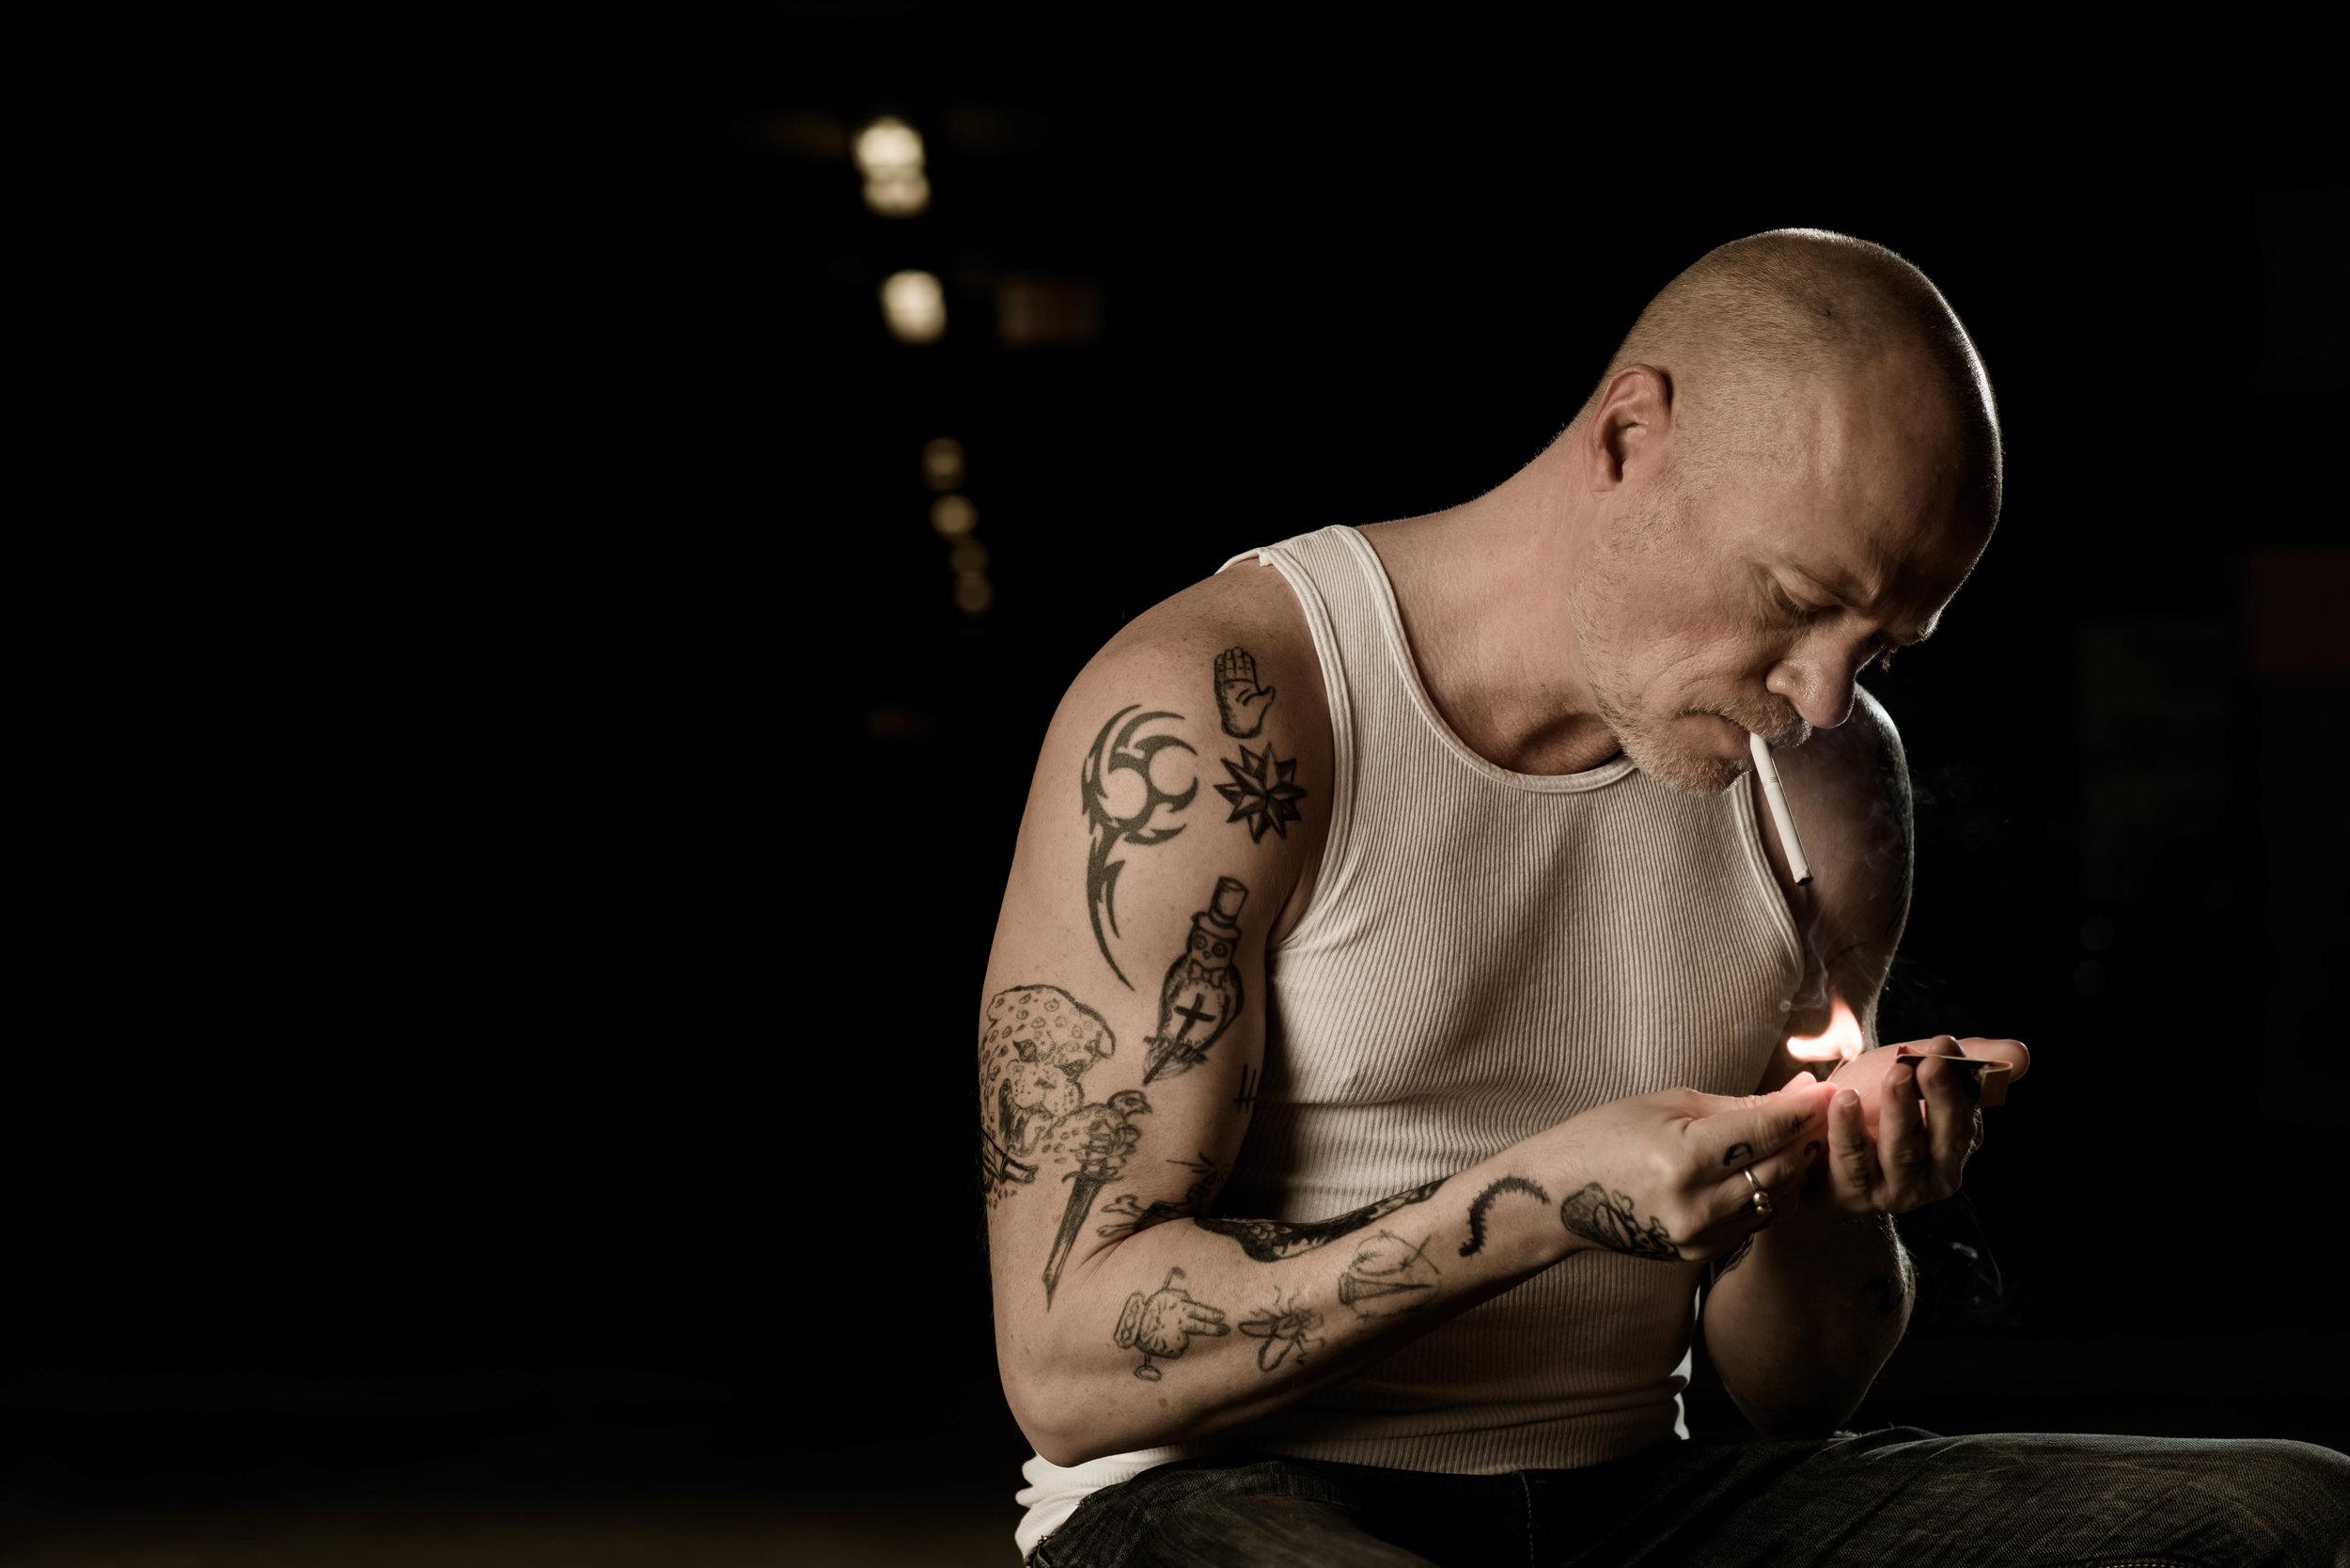 Photography: Welbert Choi Model/Actor: Leon Hanson Grooming: Elody Rivet Temporary Tattoos: Frederic Carrasco